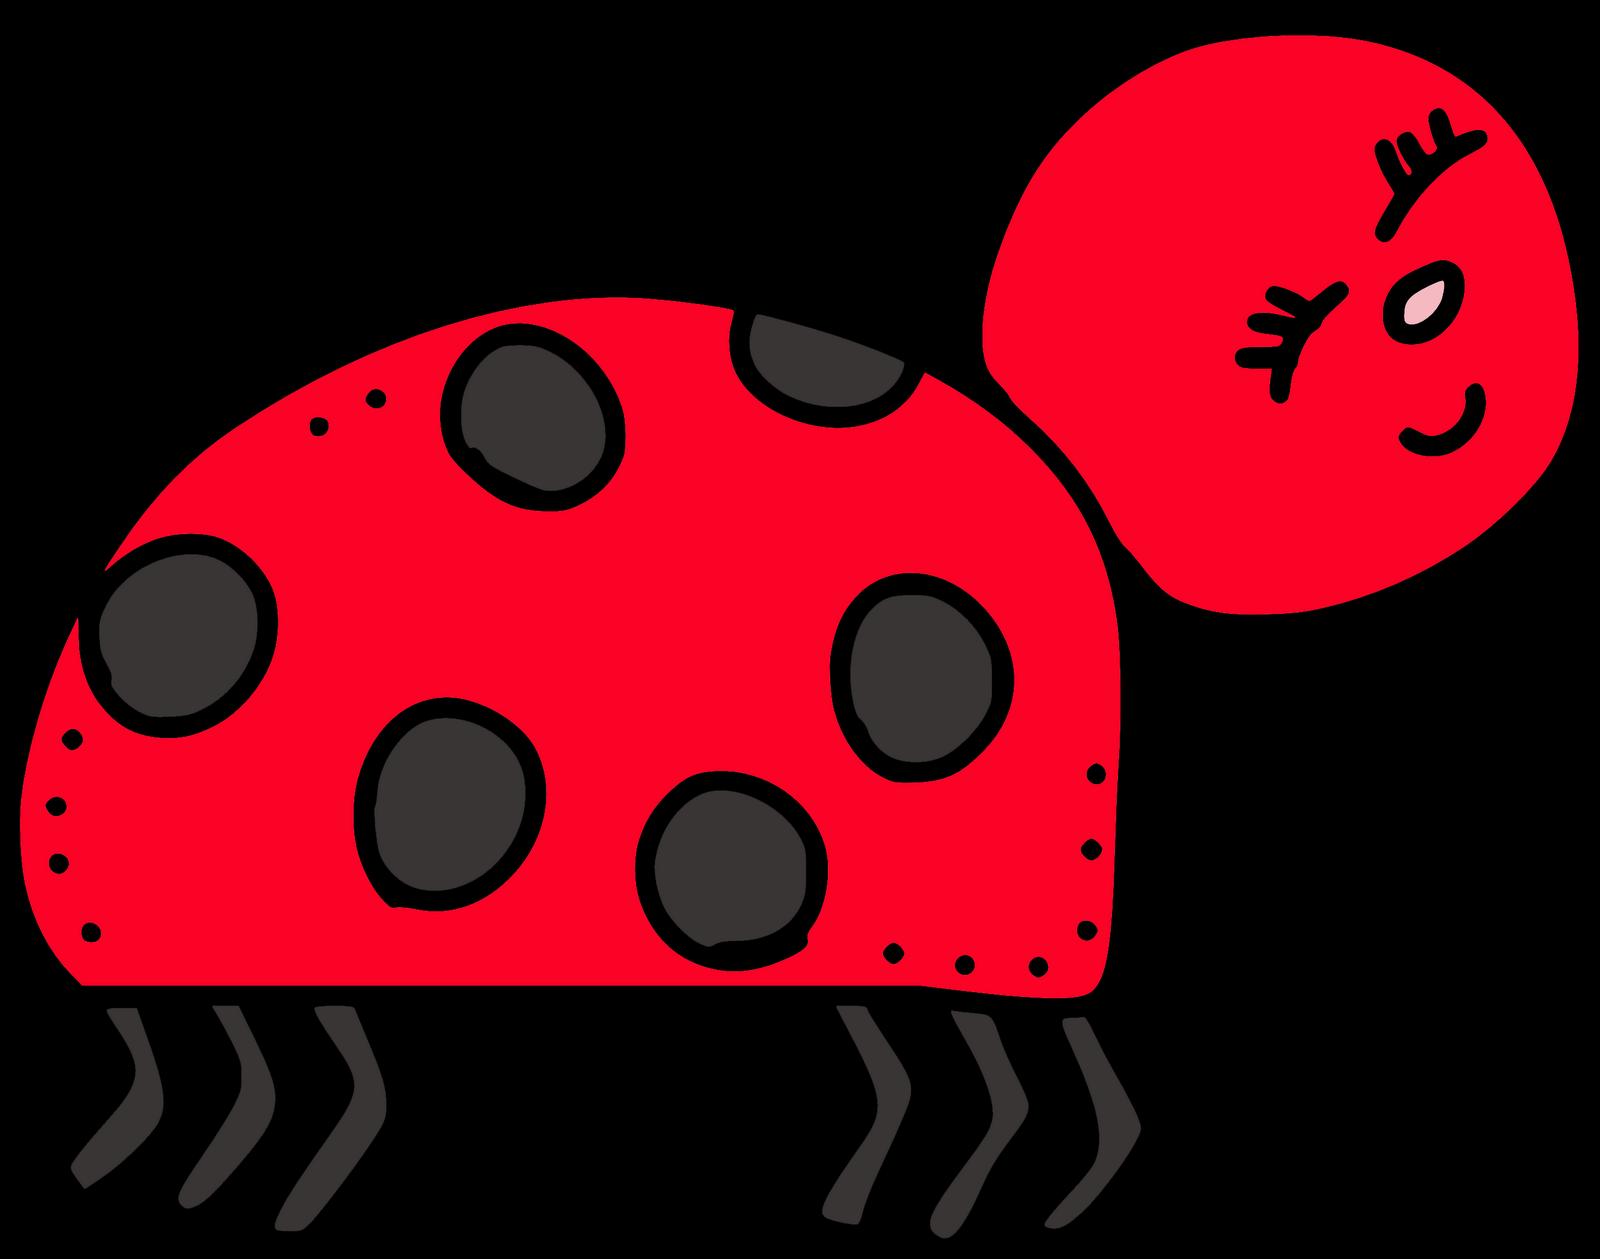 Kinder Alphabet Short Vowels Clip Art With Cvc Word Patterns Ladybug Theme Word Patterns Clip Art [ 1259 x 1600 Pixel ]